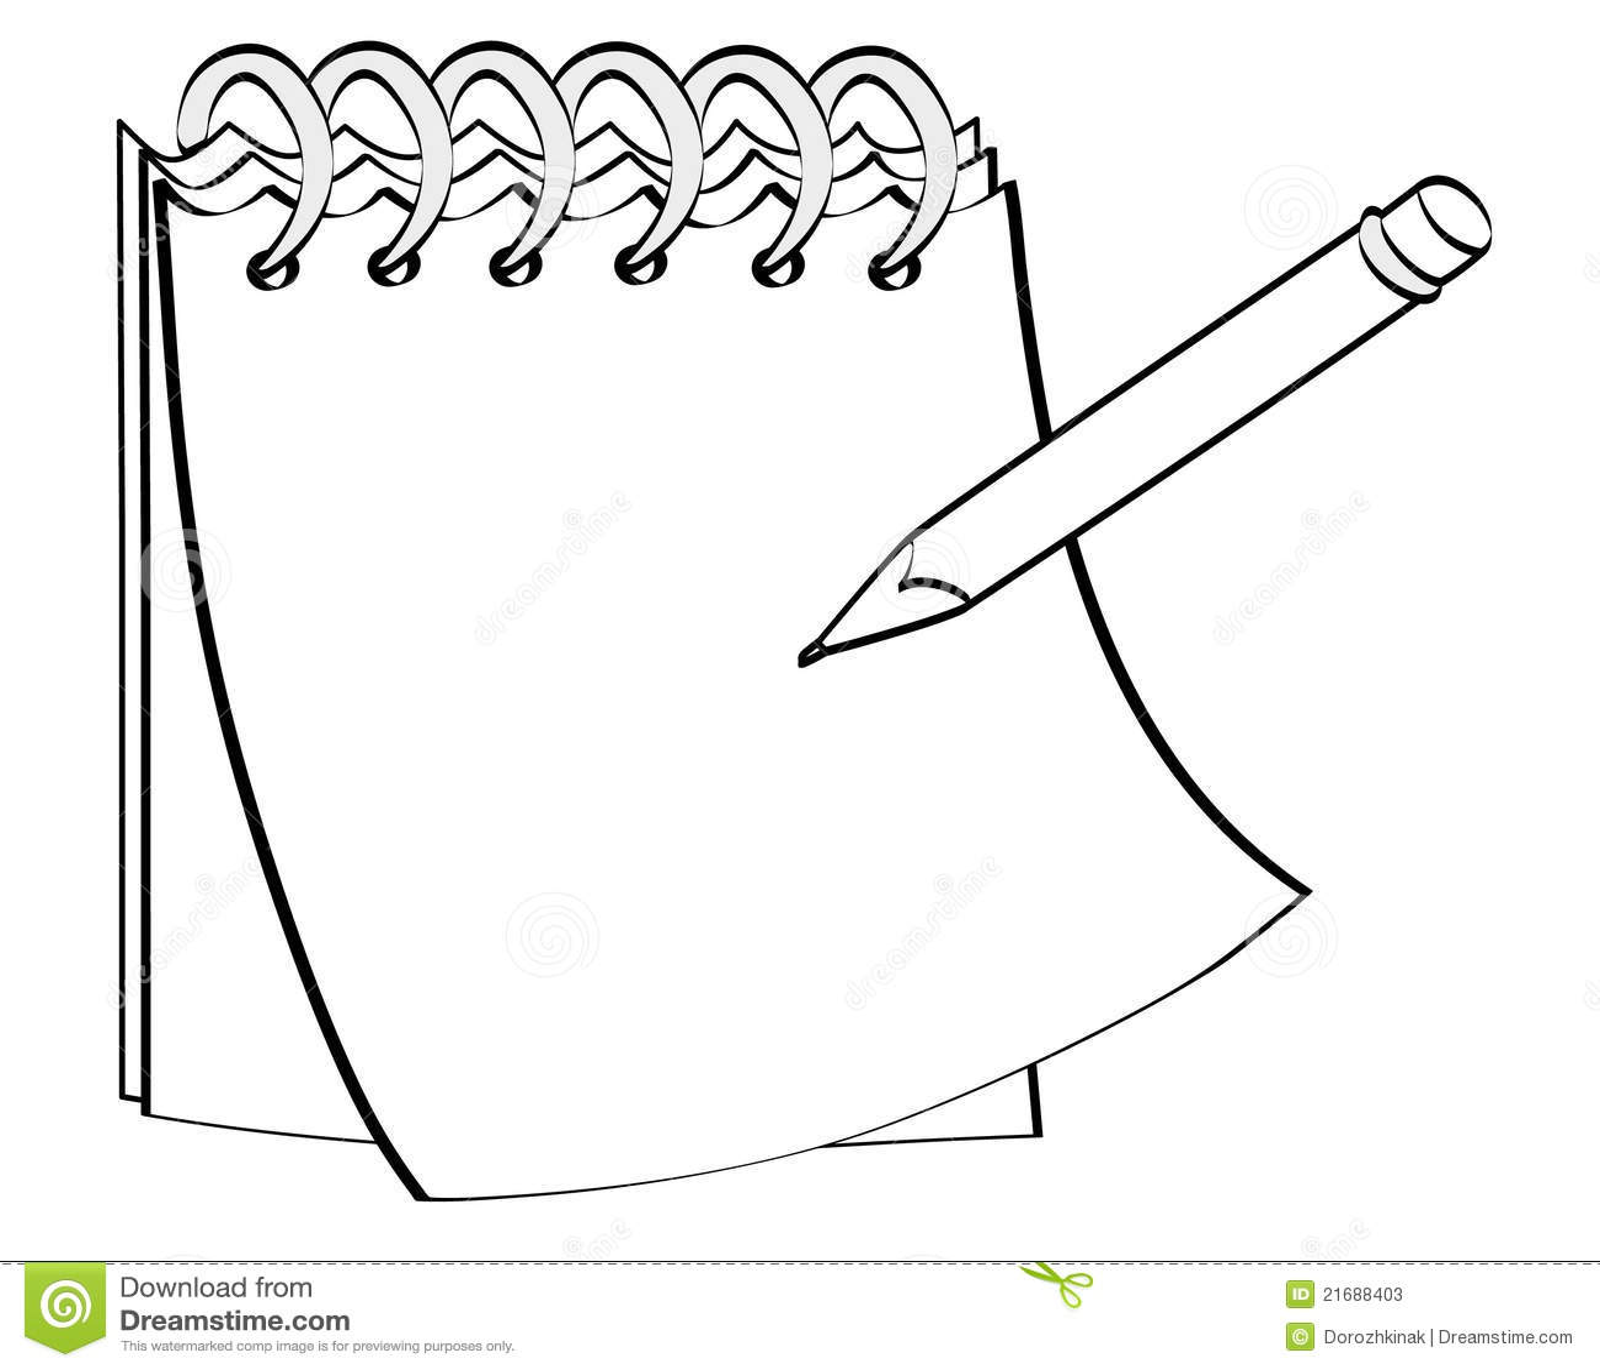 Stock Photos Notepad Pencil Image21688403 on Cartoon Coffee